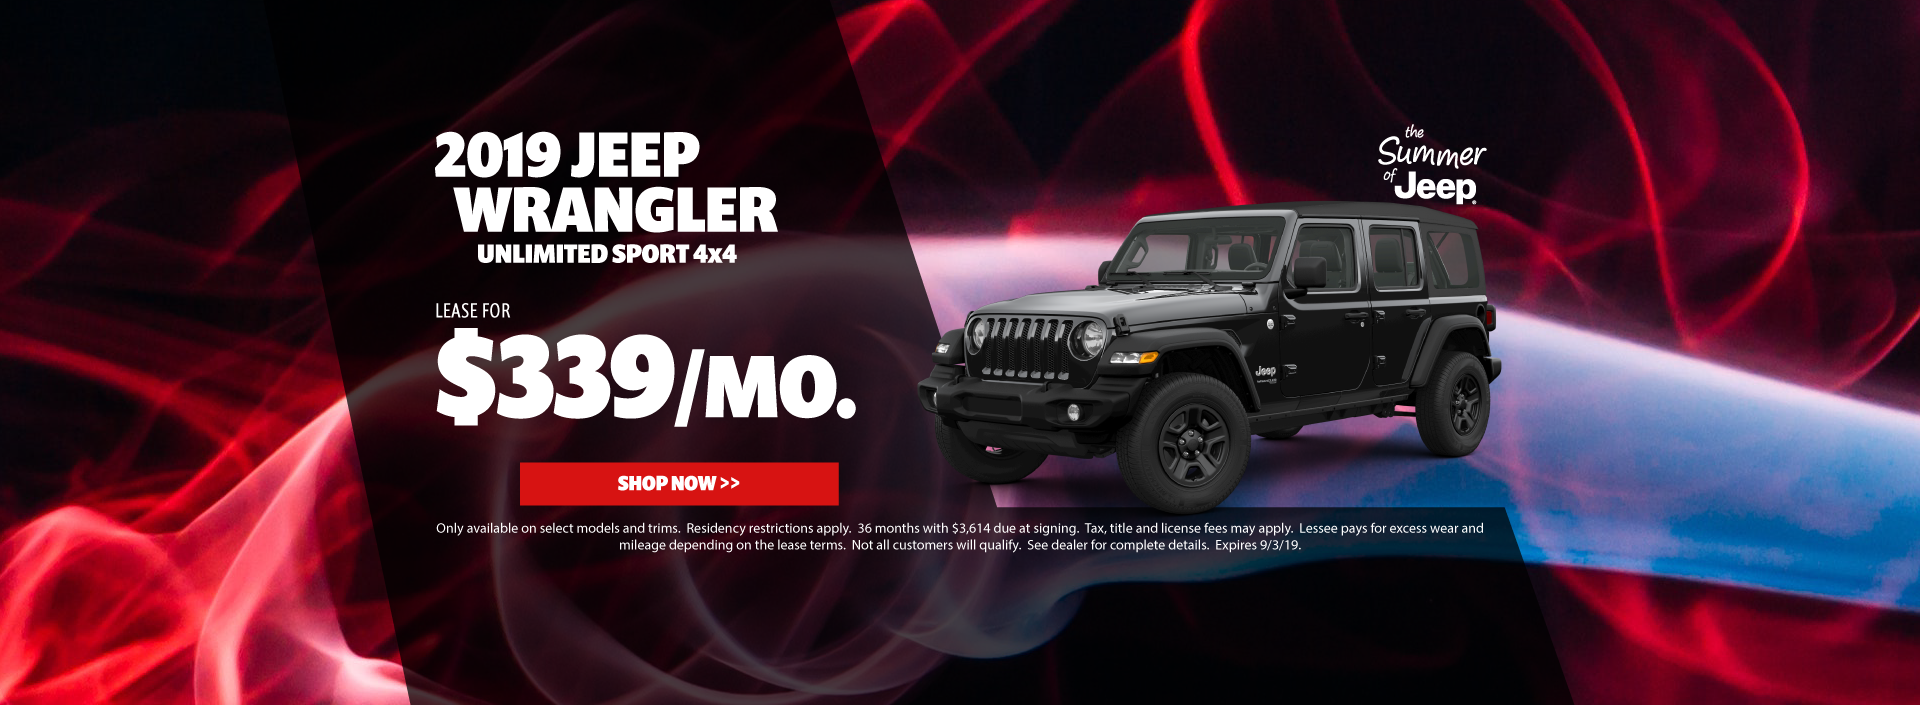 2019 Jeep Wrangler Special